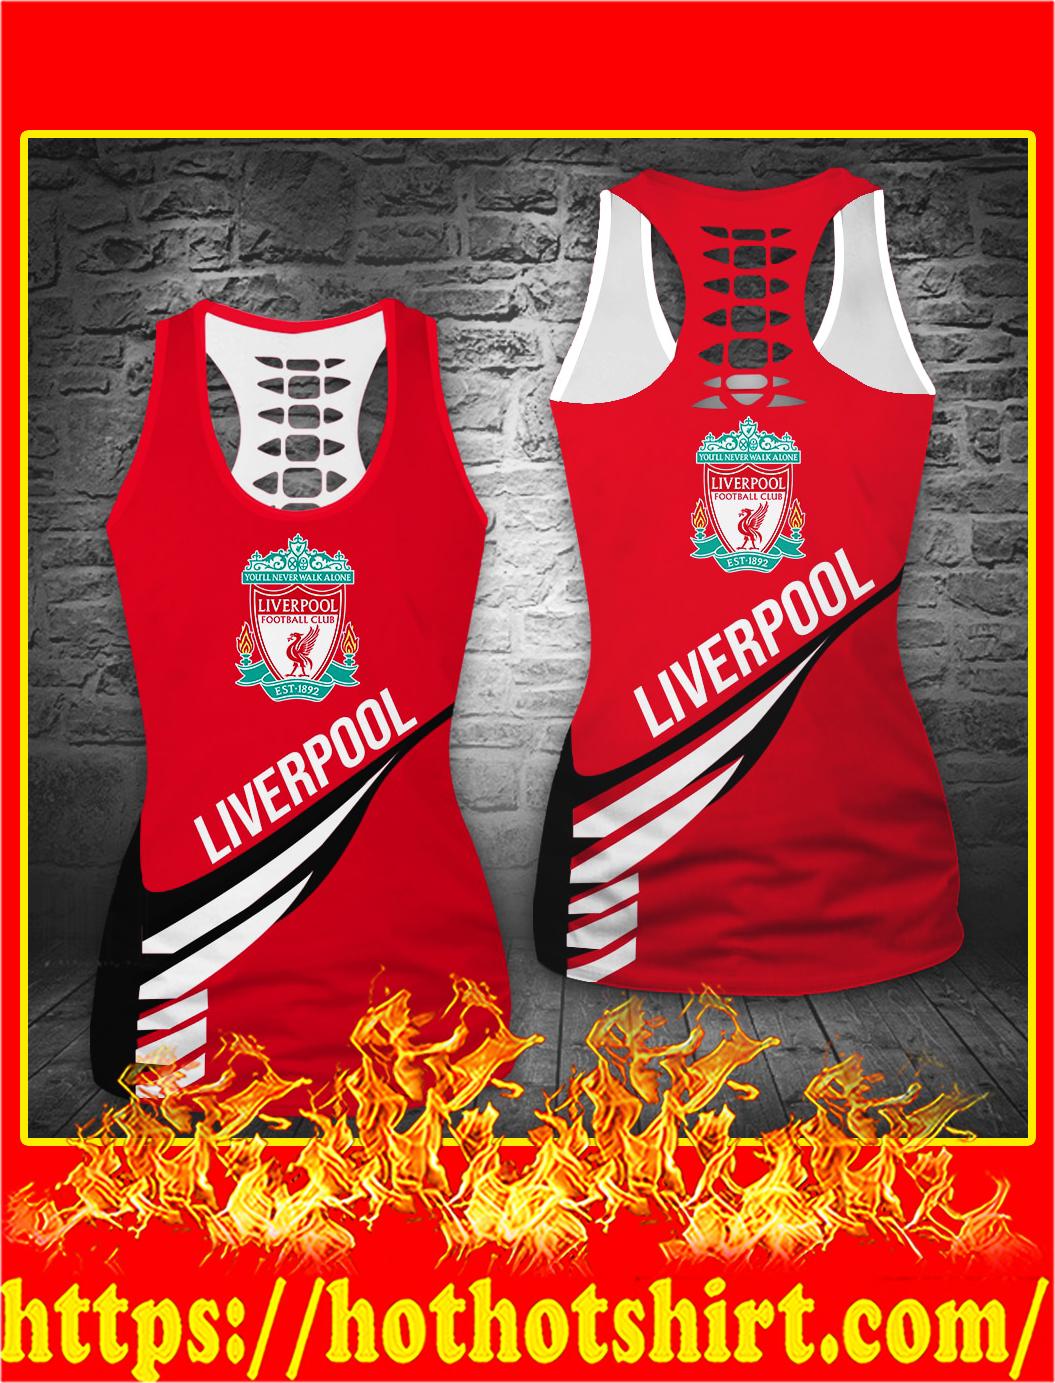 Liverpool football club hollow tank top